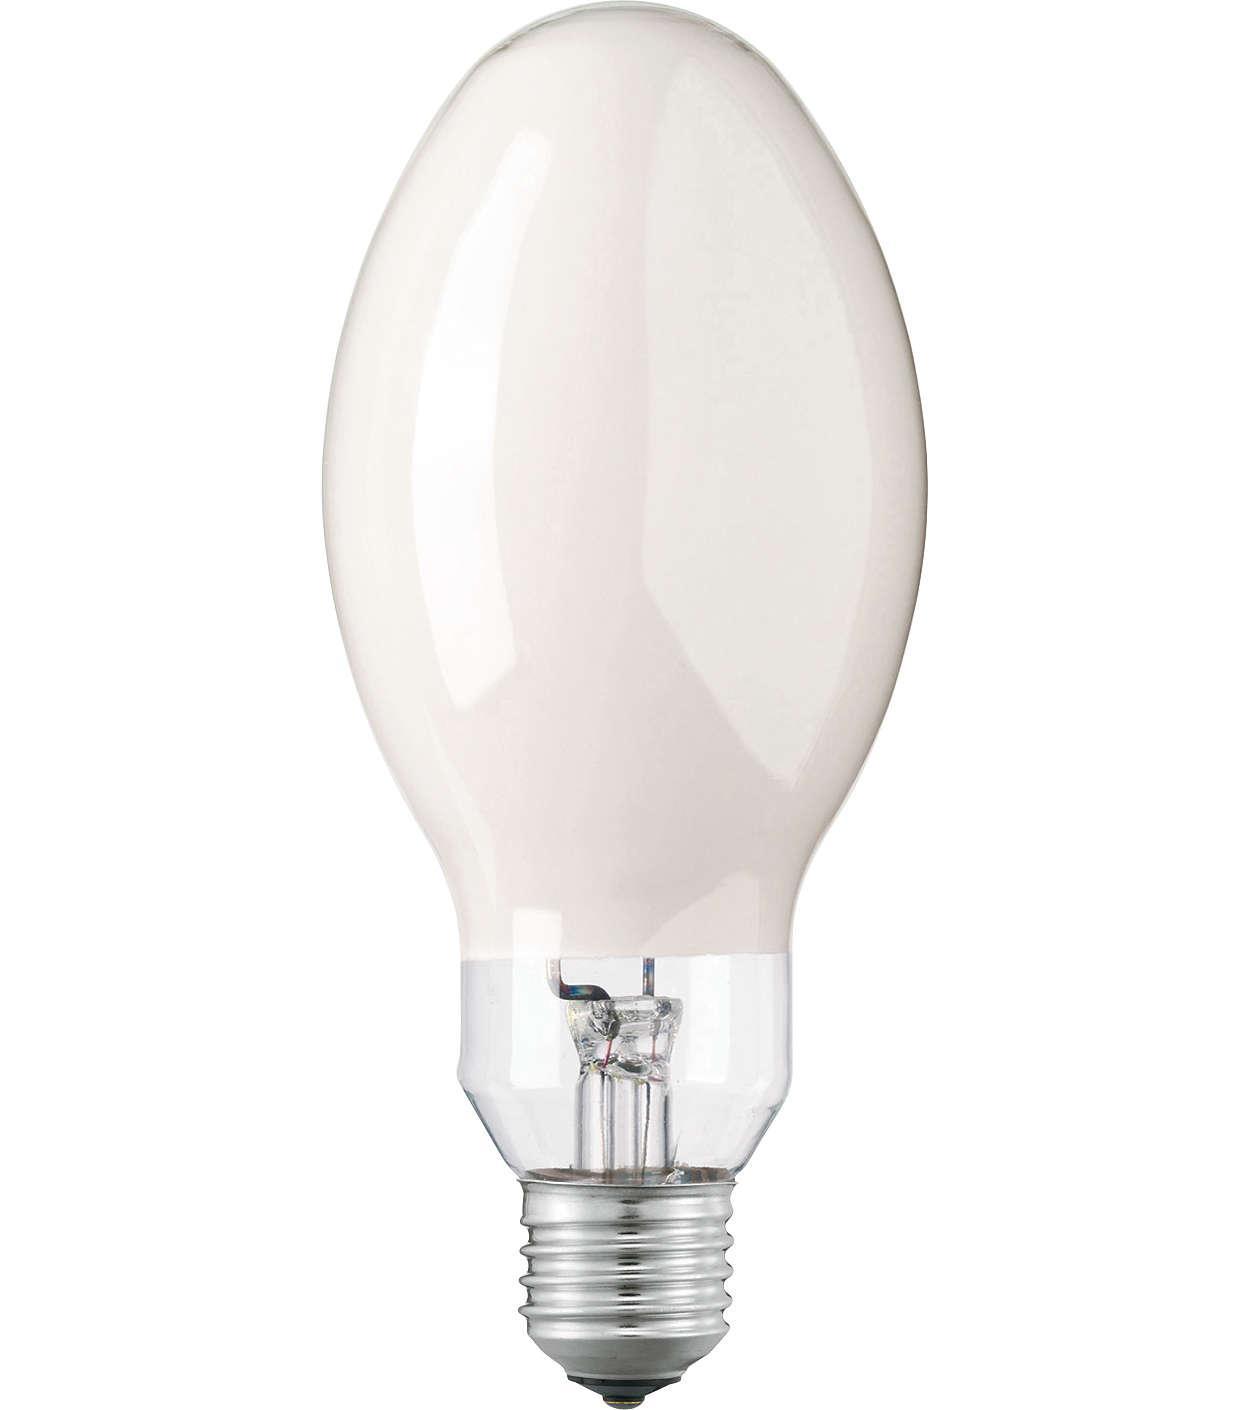 LAMPU MERCURY PHILIPS HPL-N 250W/542 E40 HG